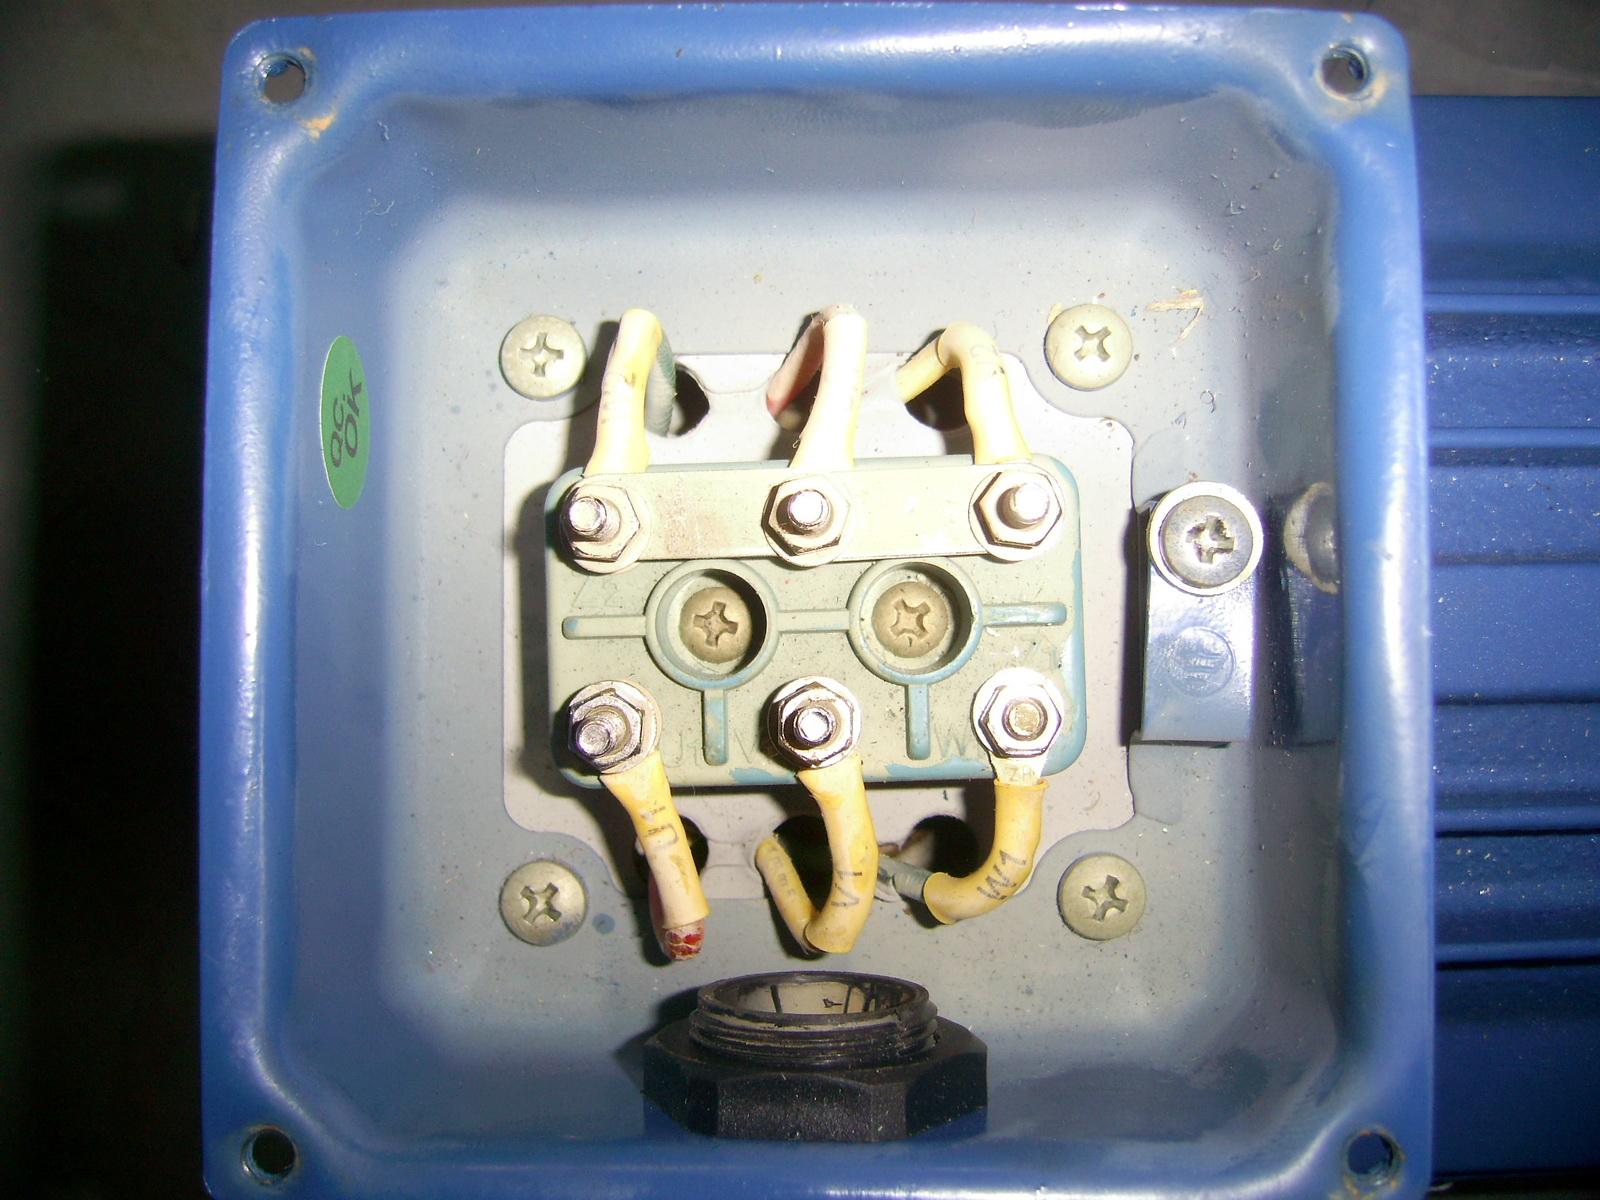 схема включения вентилятора эв